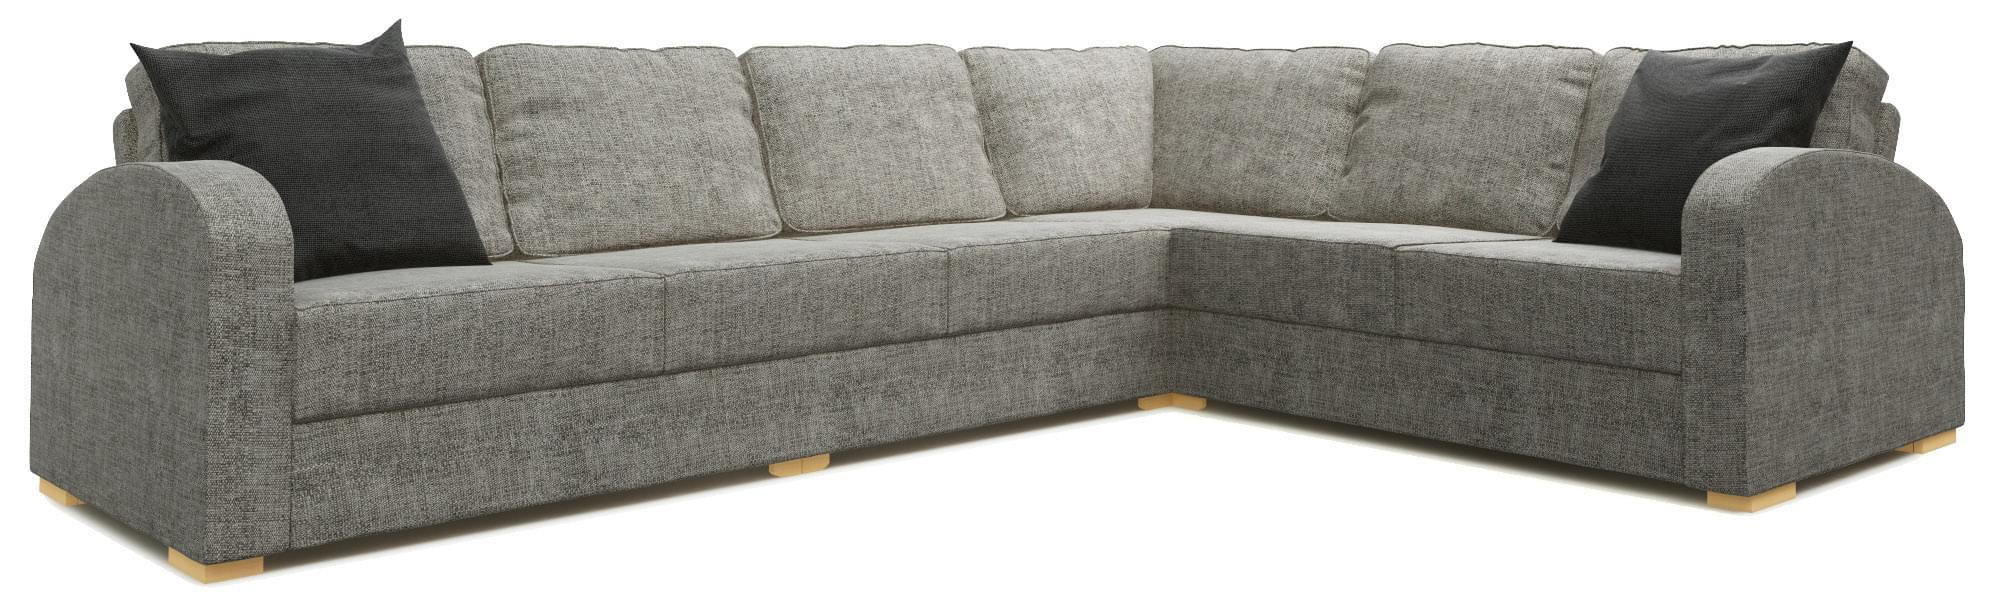 Holl 4X3 Corner Sofa